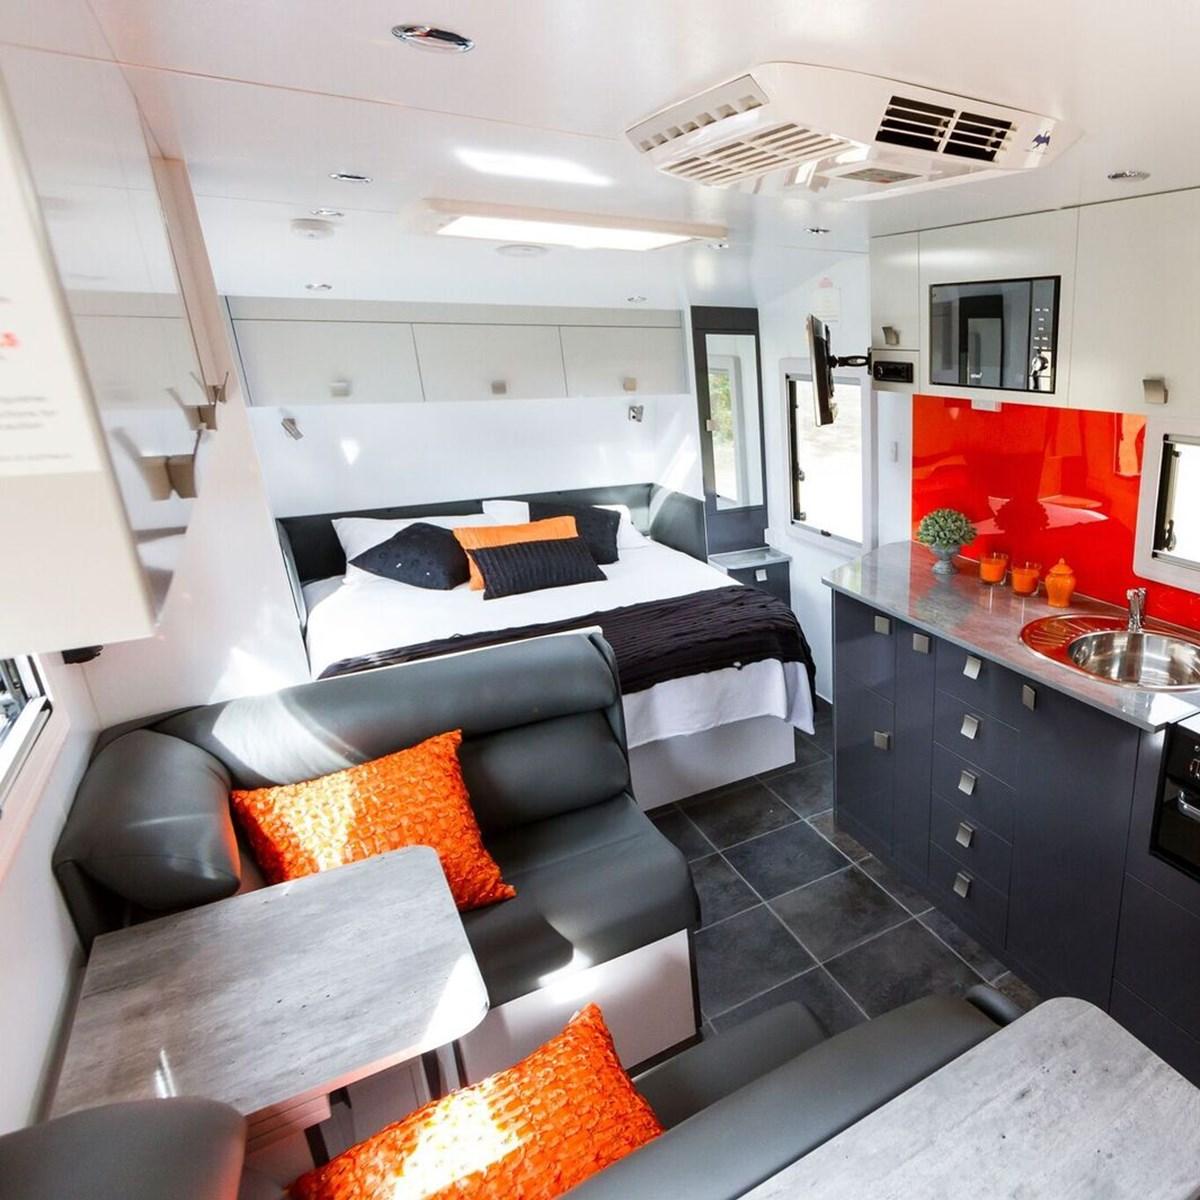 Economic Benefits of Small Caravans with Ensuite